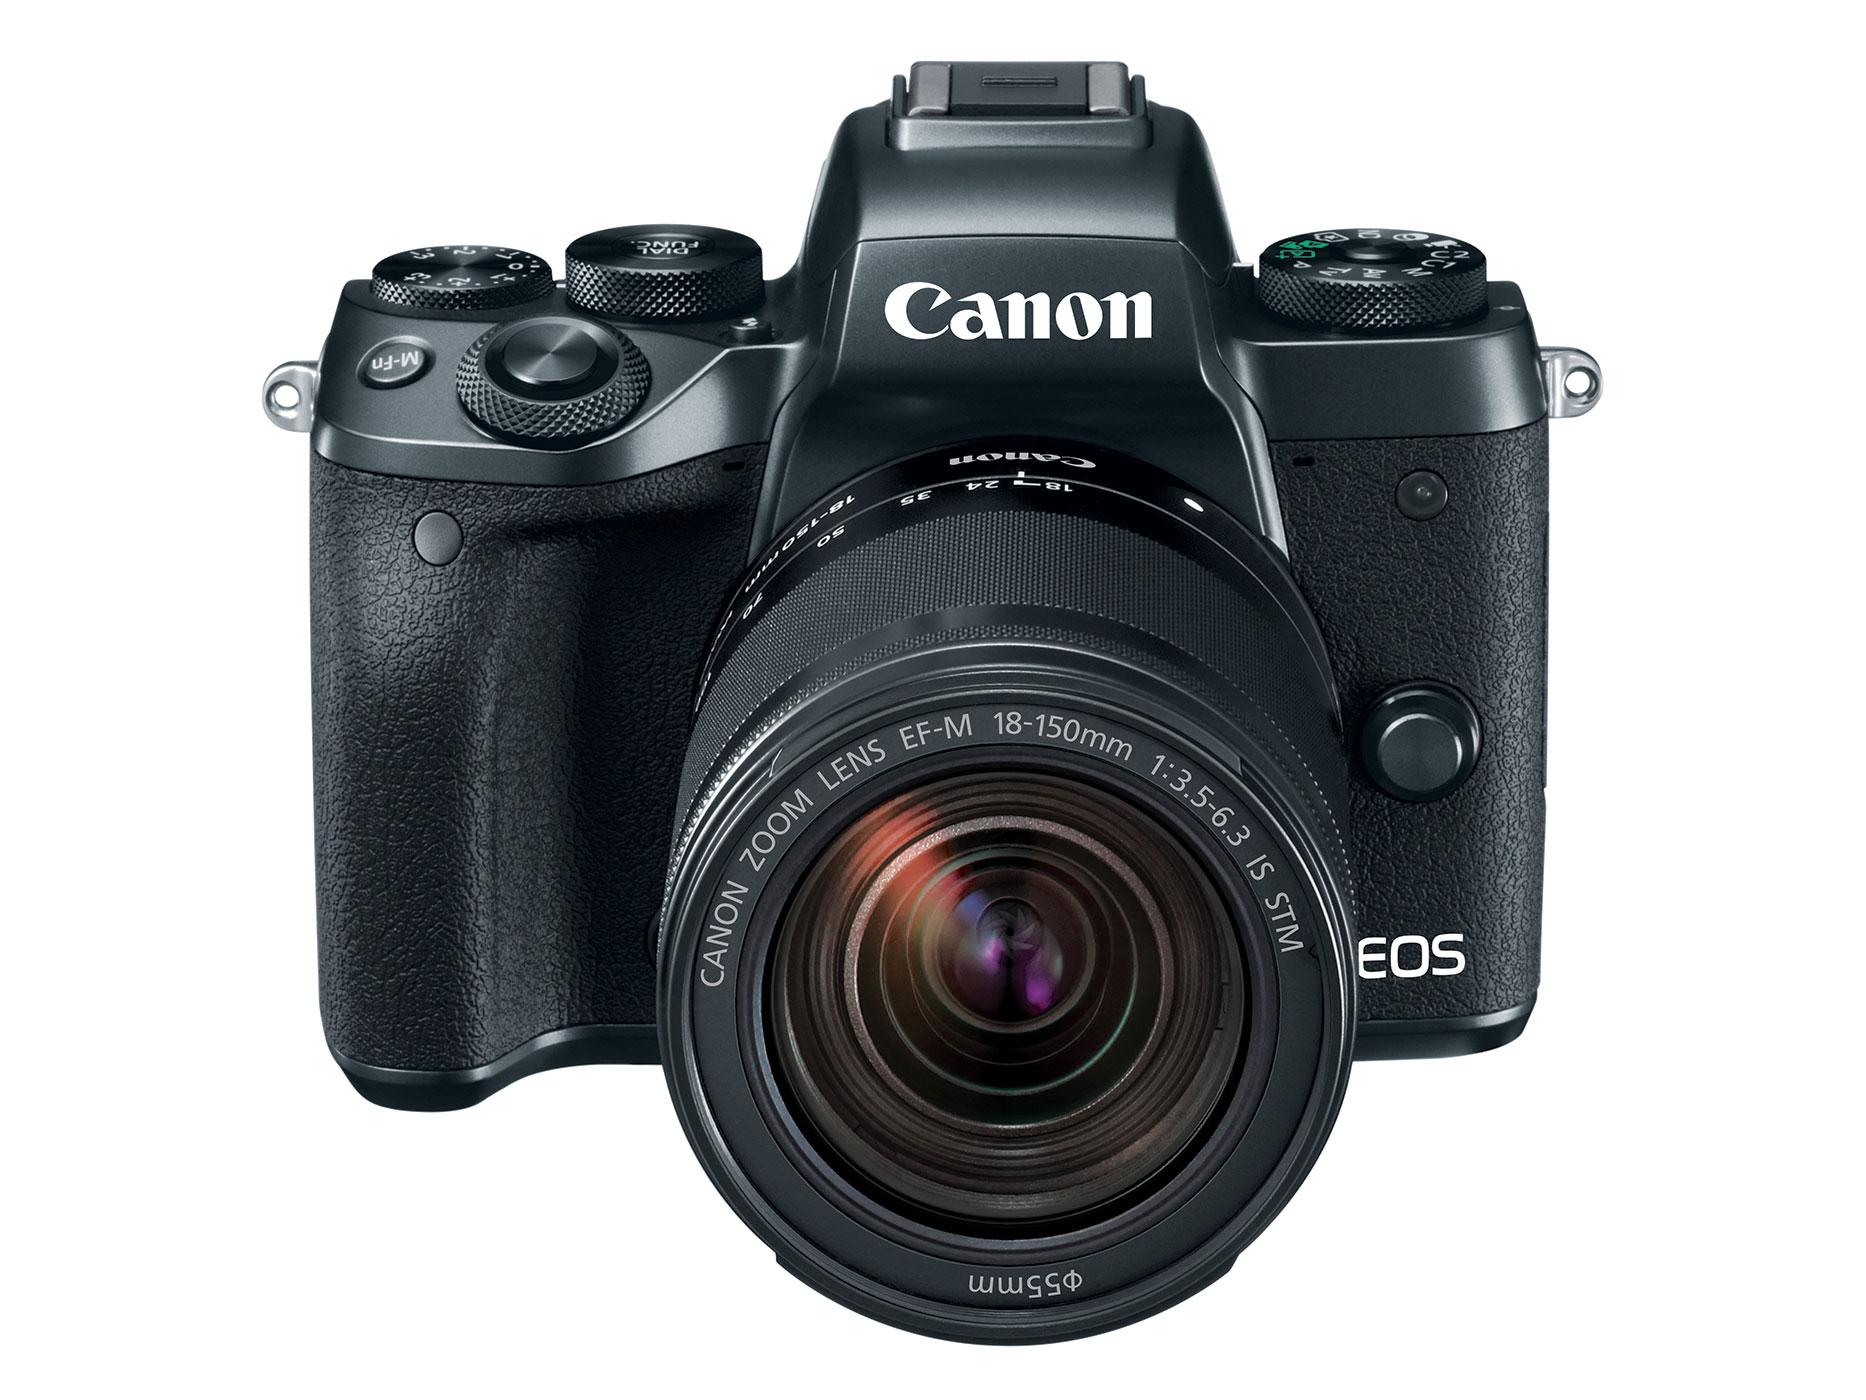 canon_eos_m5_01_1.jpg